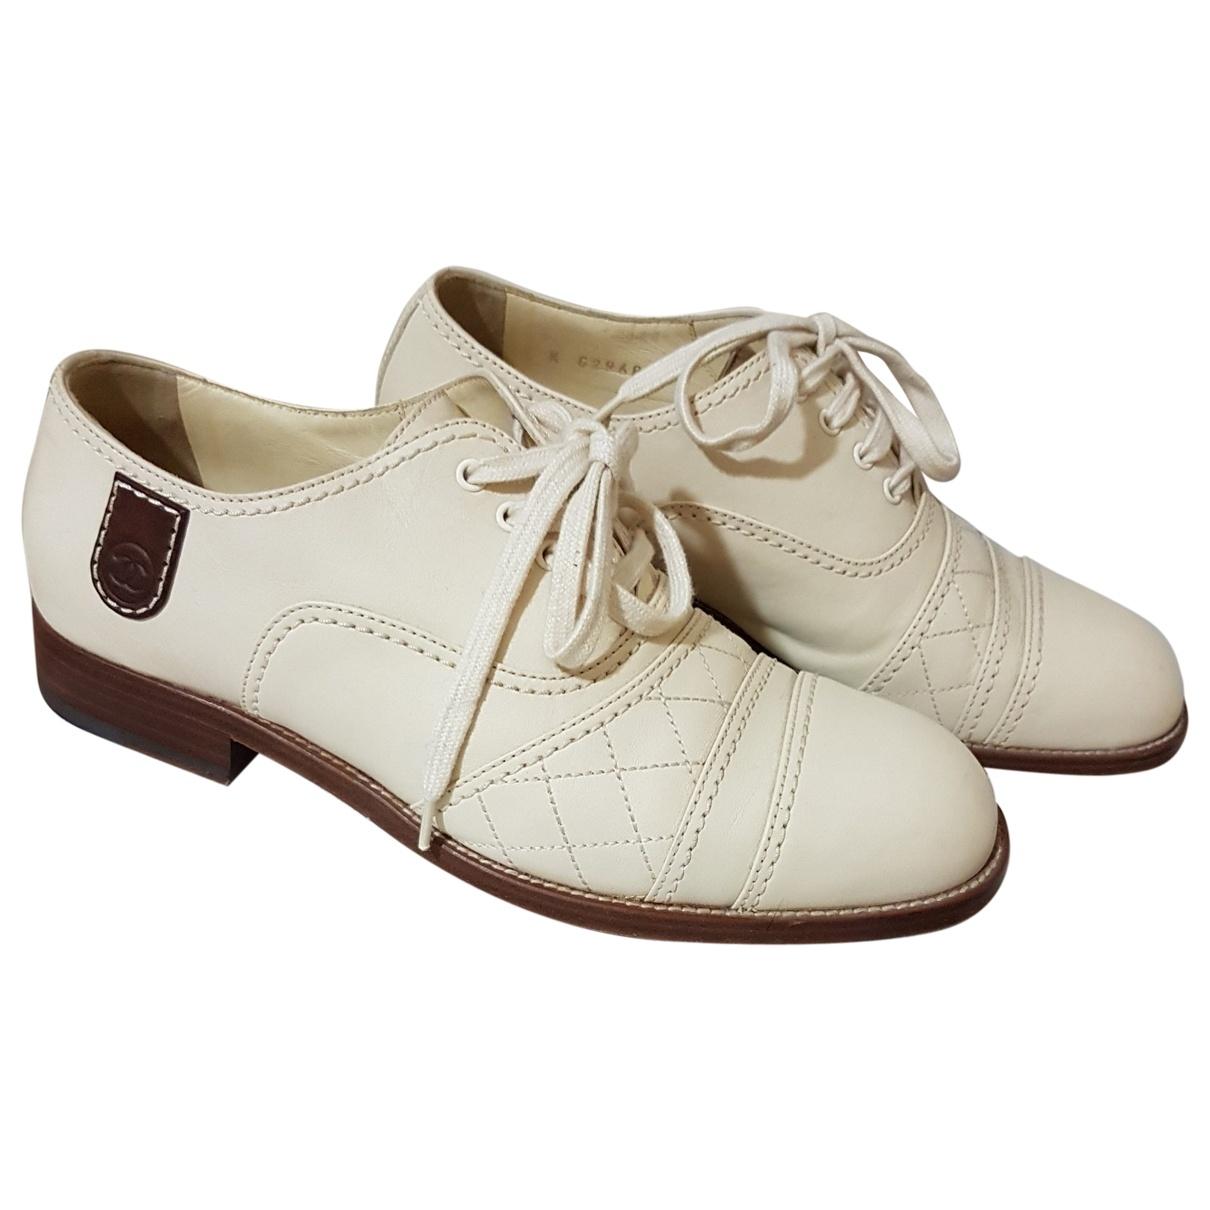 Chanel \N Beige Leather Flats for Women 39 EU